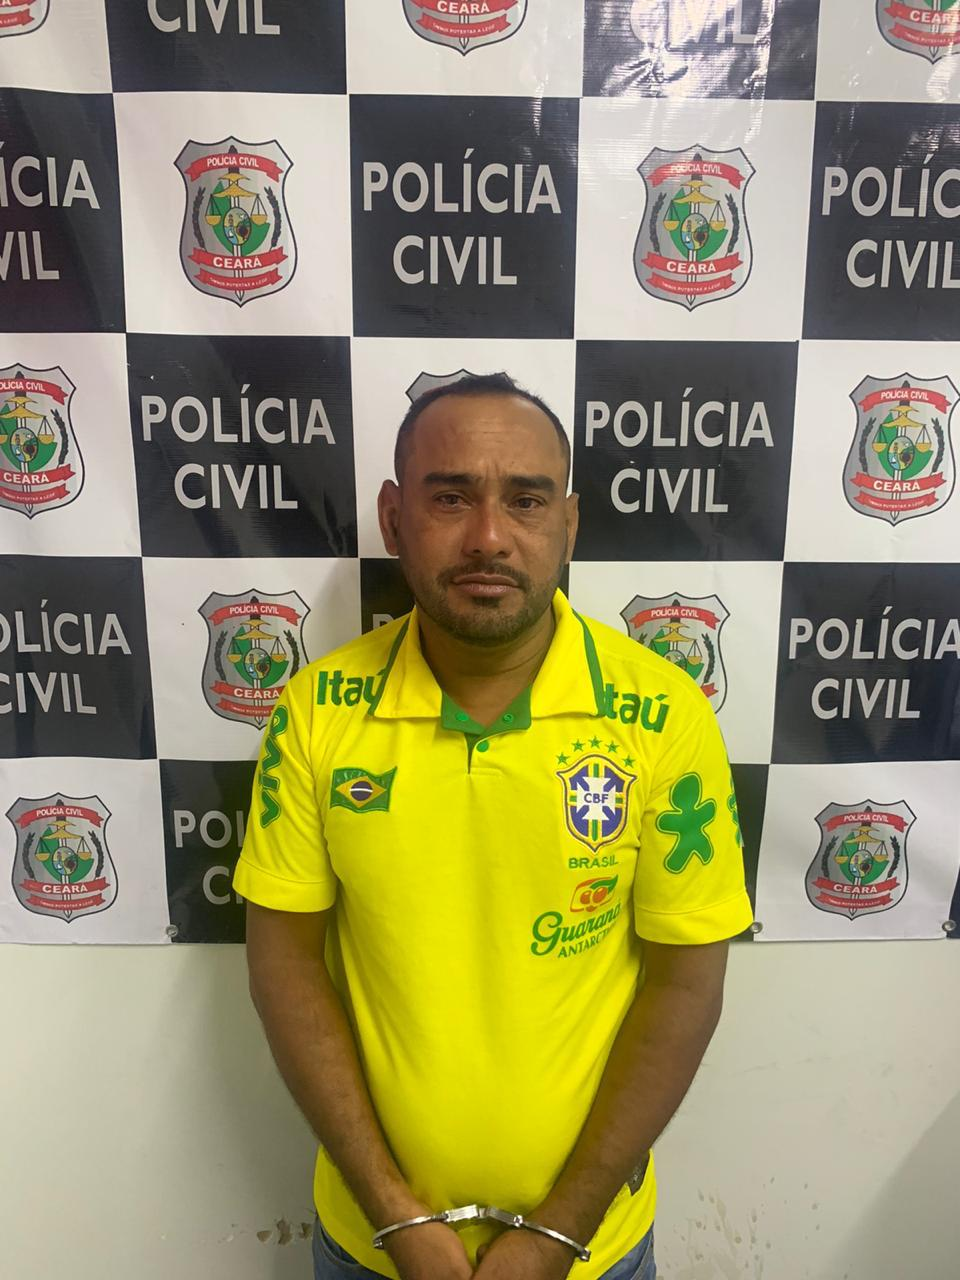 Líder comunitário preso acusado de extorquir vereador de Fortaleza